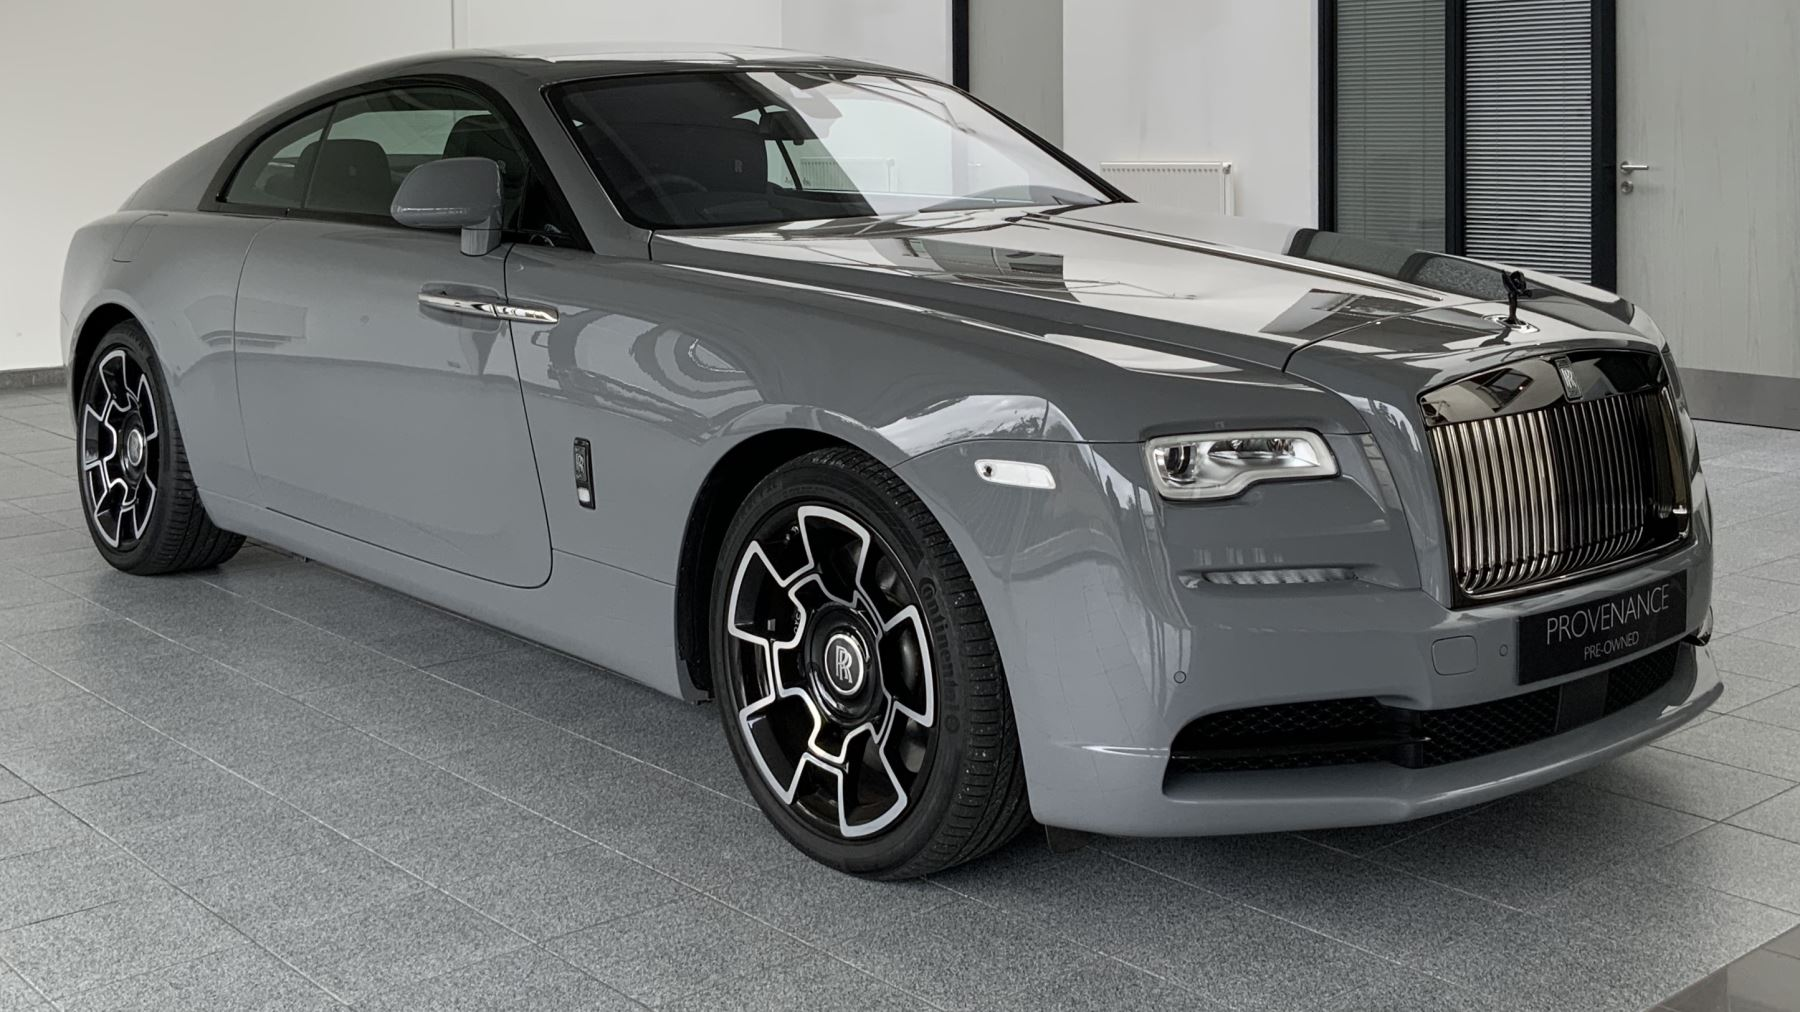 Rolls-Royce Black Badge Wraith V12 6.6 Automatic 2 door Coupe (2019)